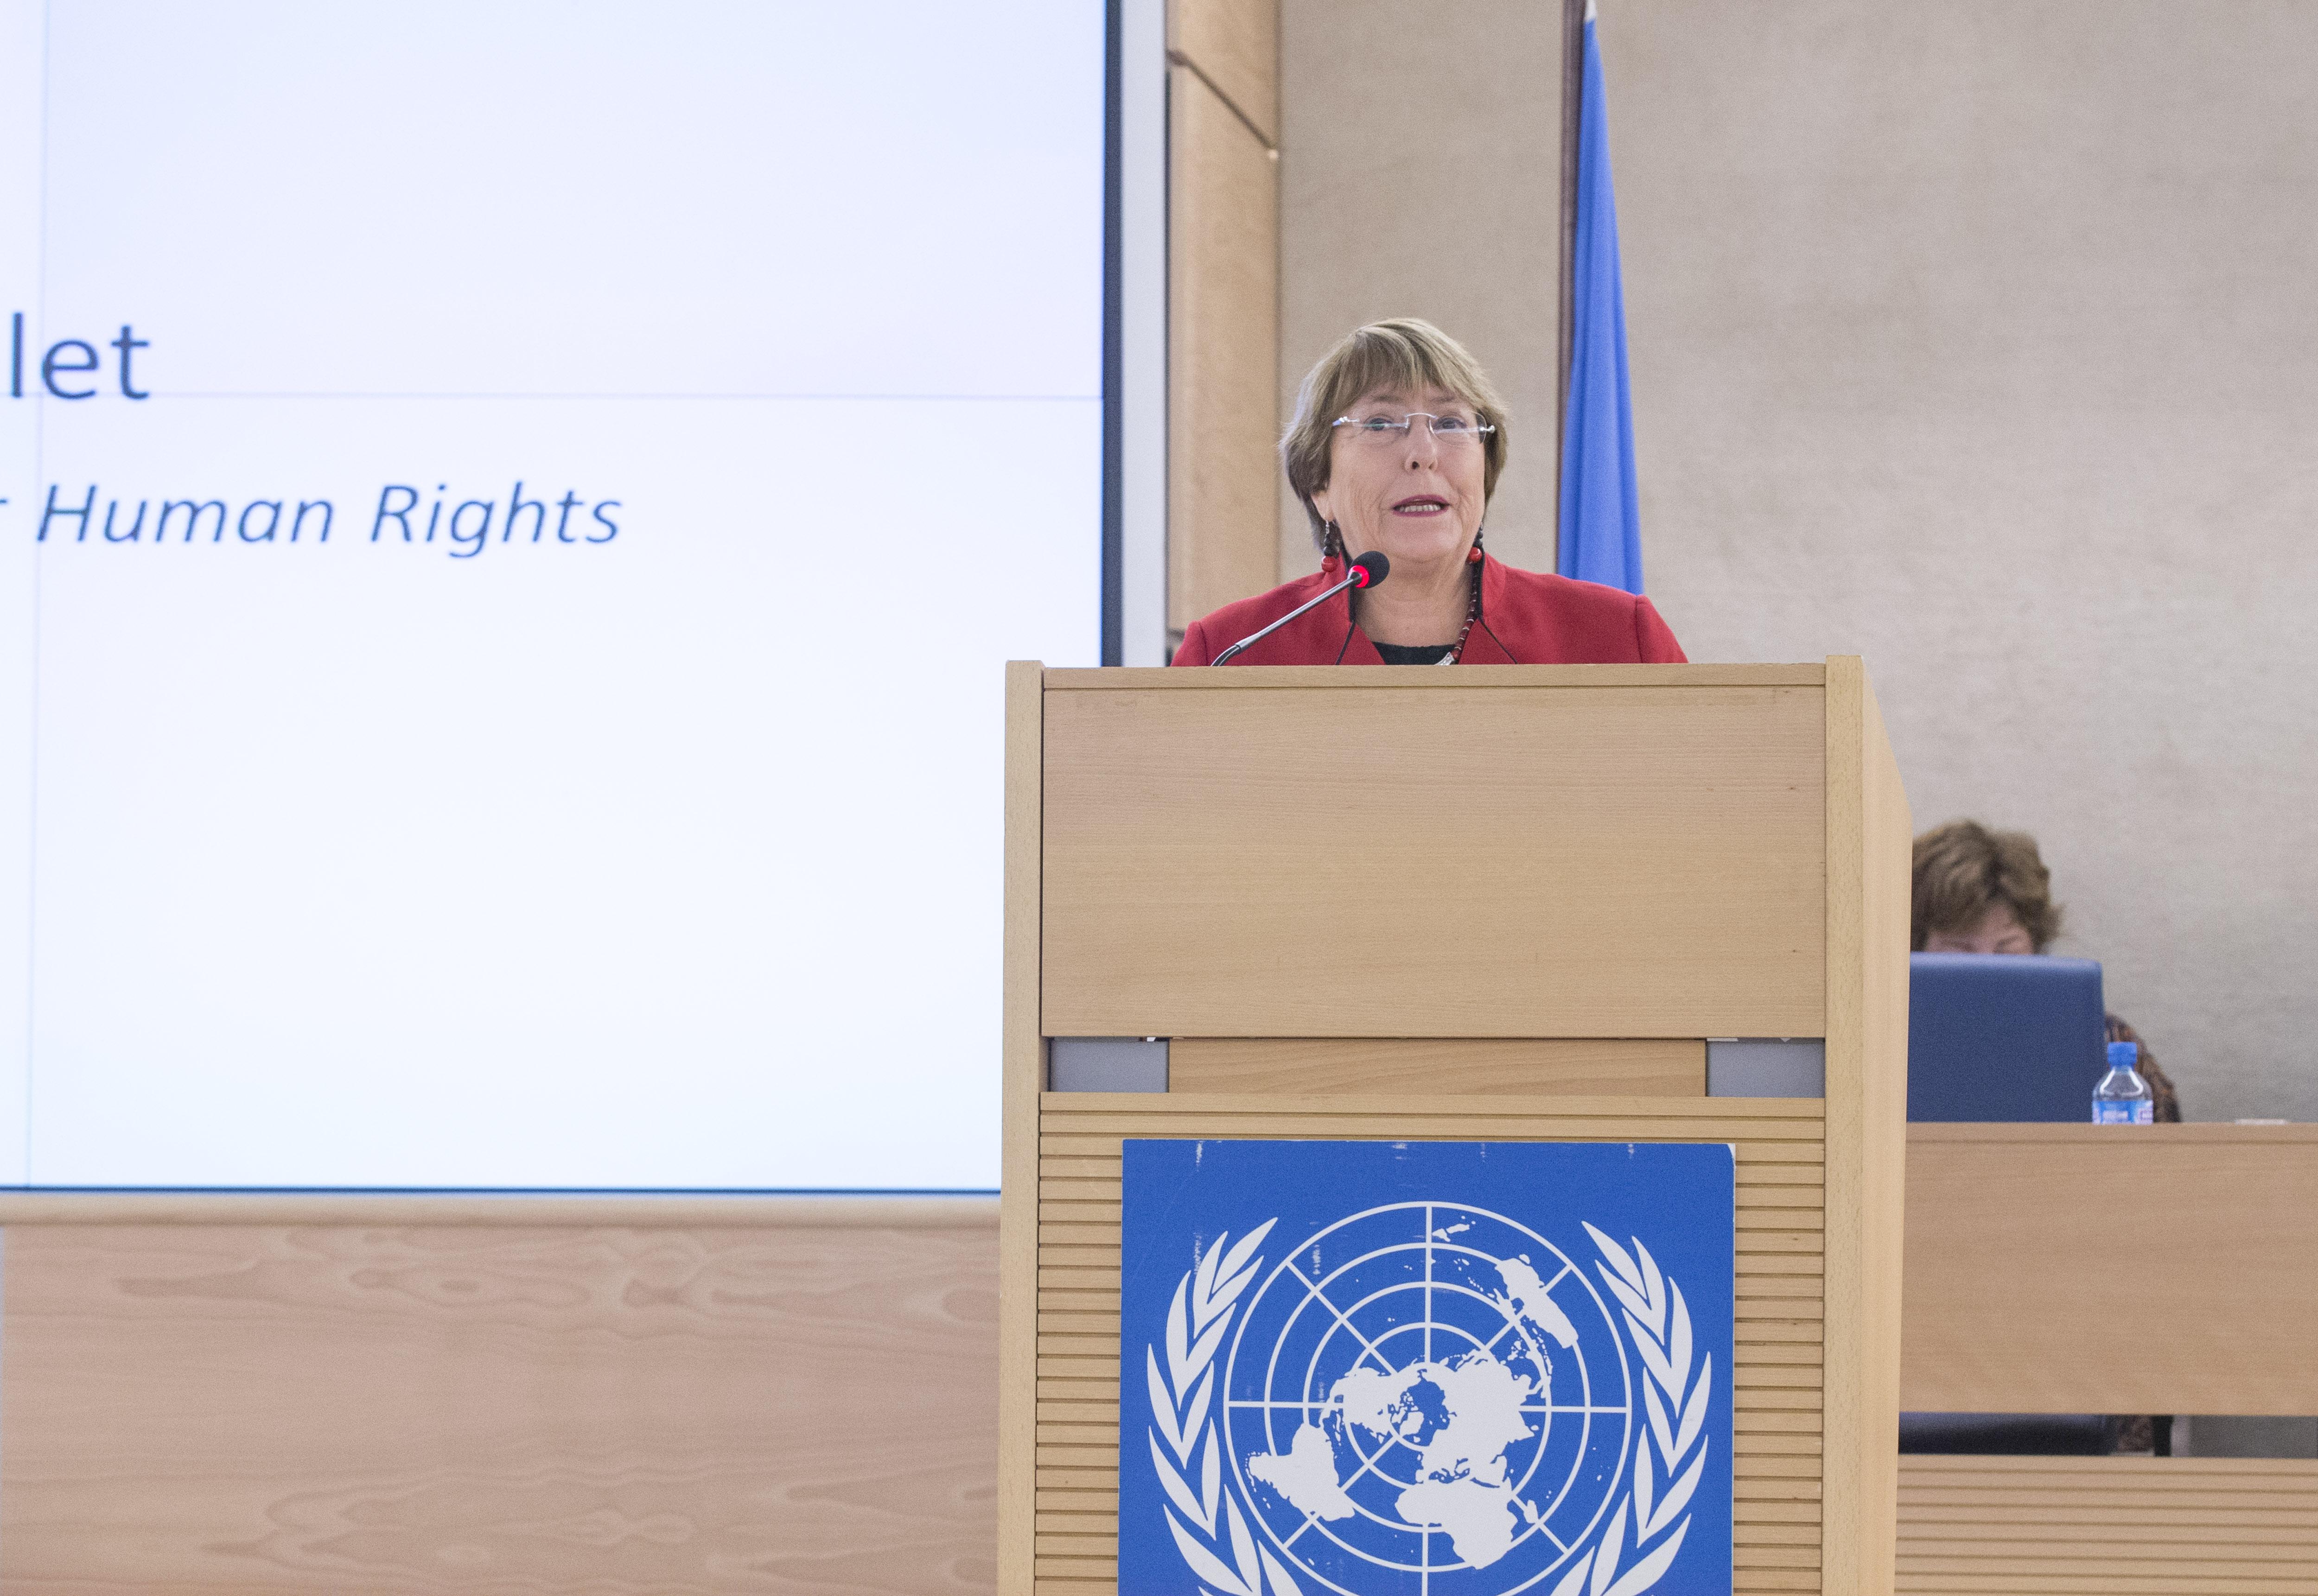 """I remain deeply disturbed"": UN human rights chief expresses concern about U.S., EU migration policies - Xinhua   English.news.cn"